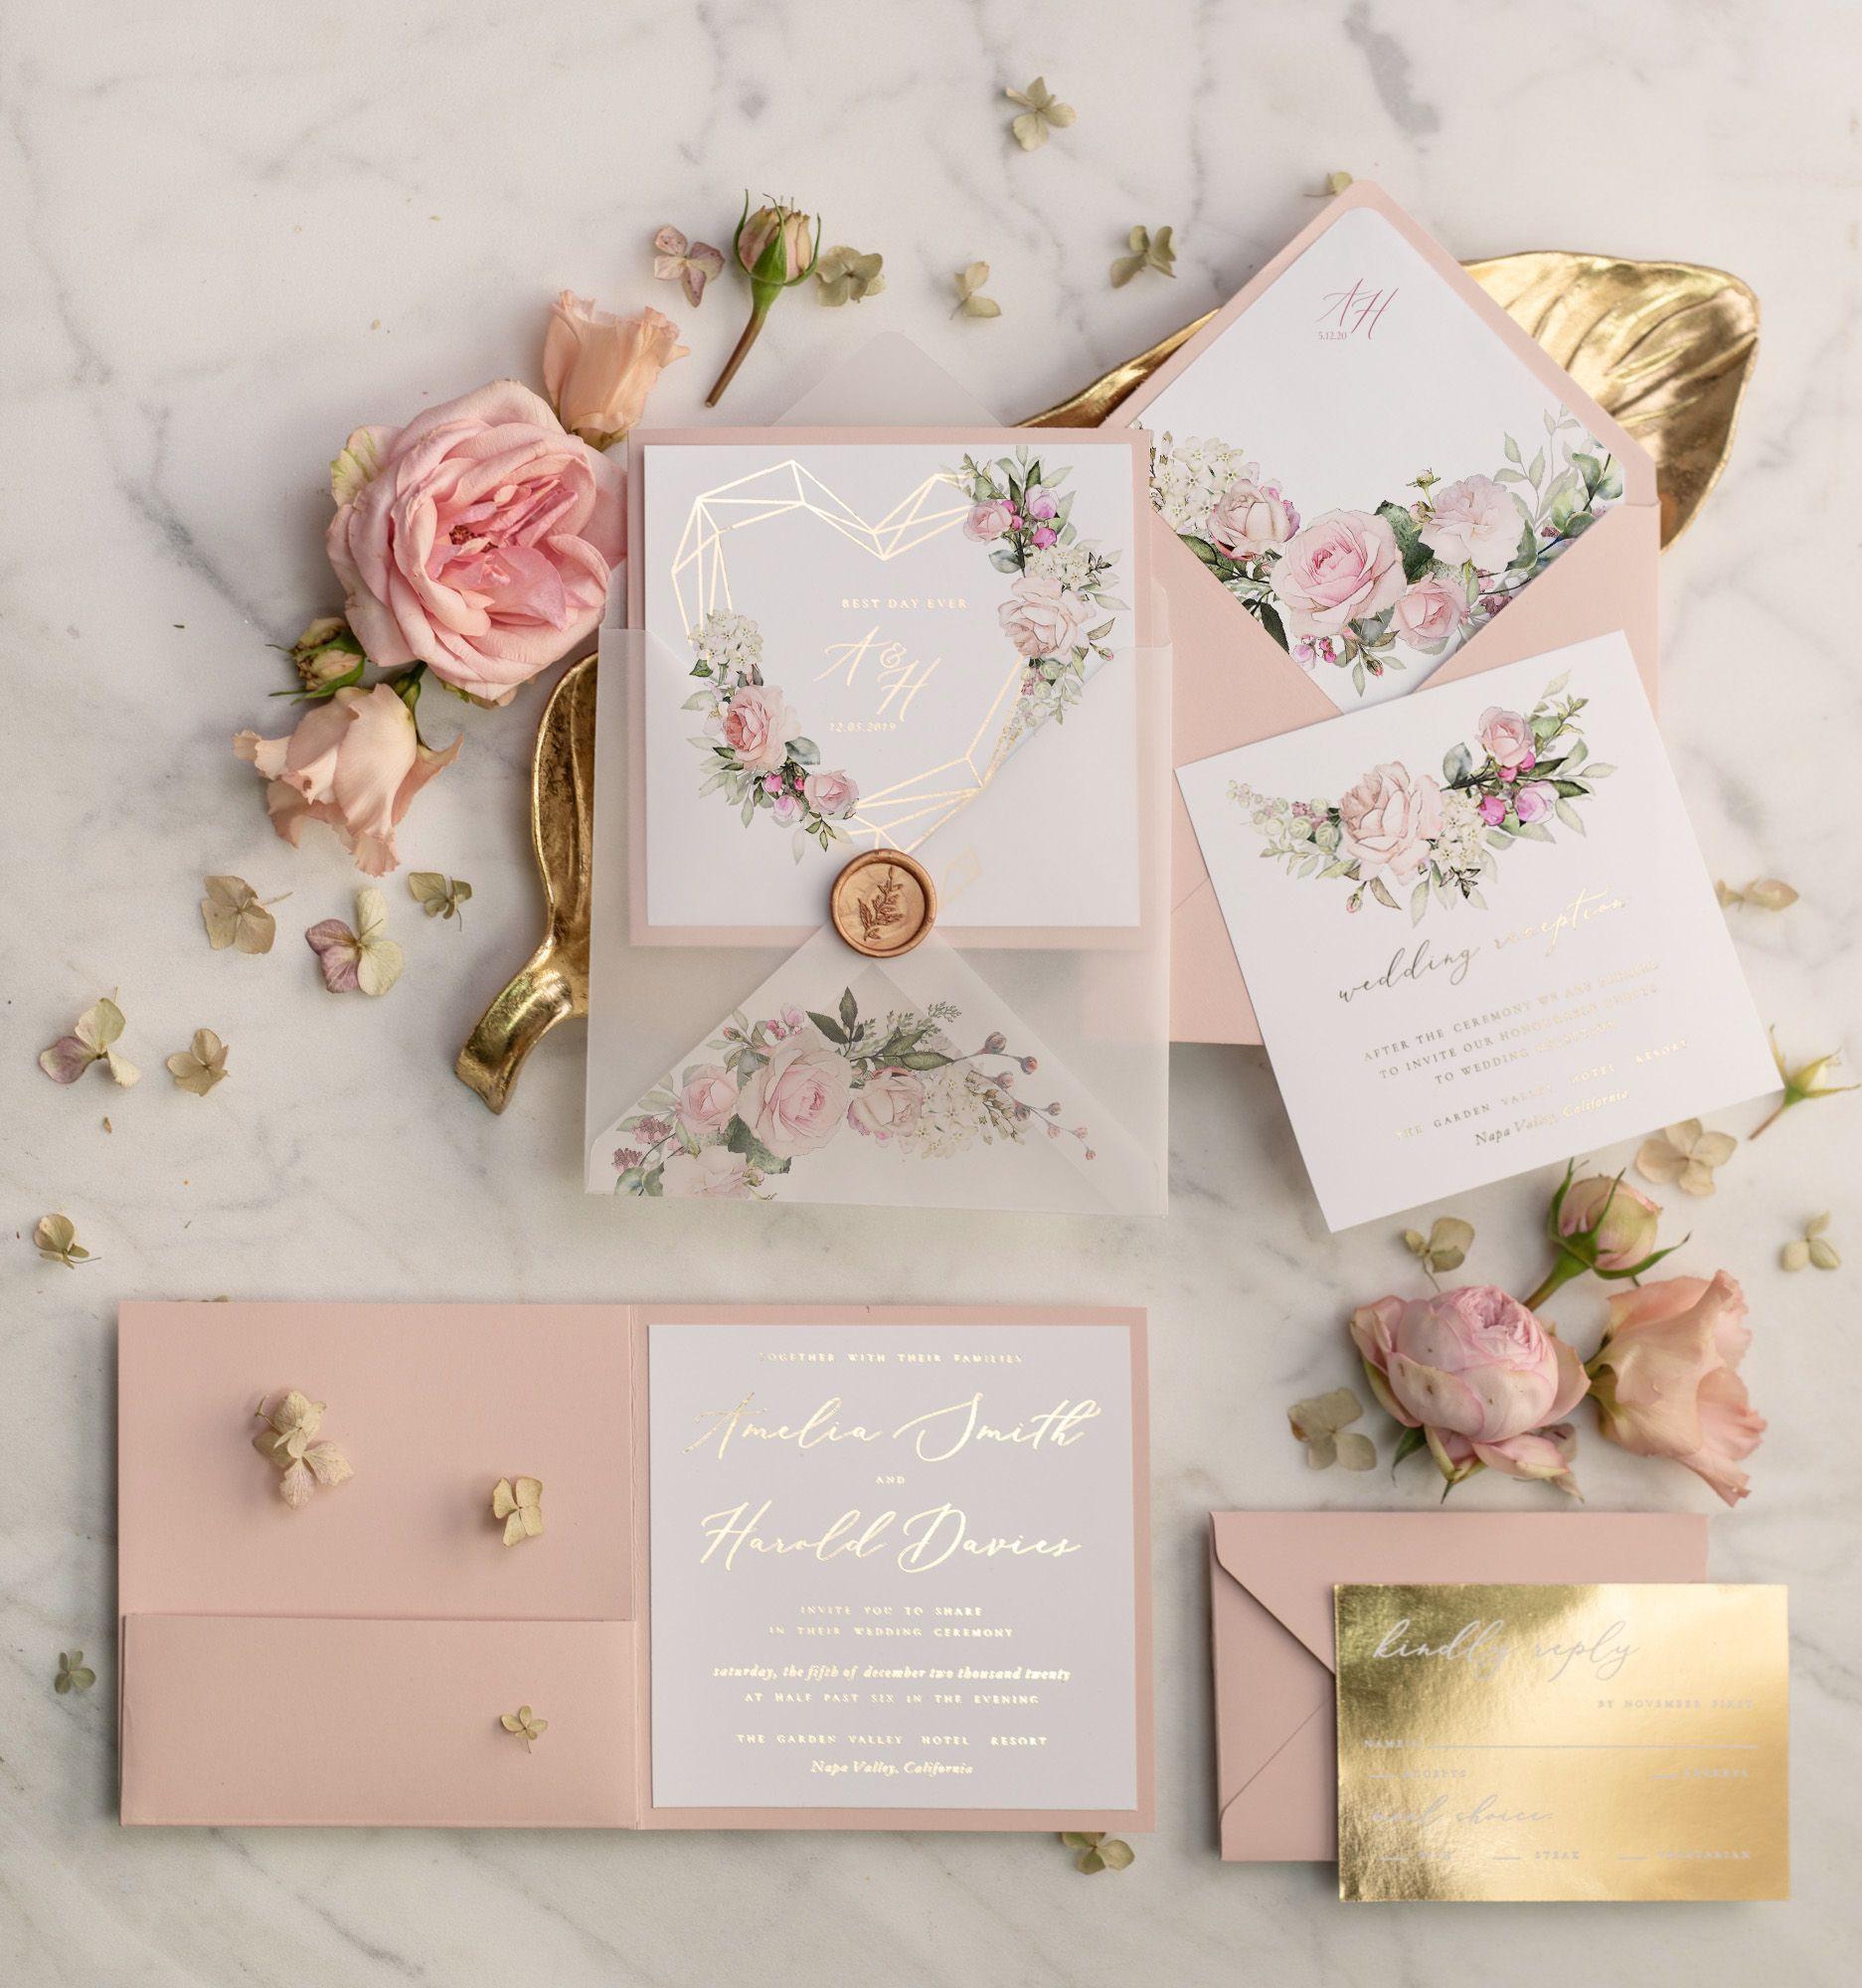 Wedding Invitations Gold Rose Gold Silver Glitter 3 Heartg Z Wedding Invitations Uk Cheap Wedding Invitations Affordable Wedding Invitations